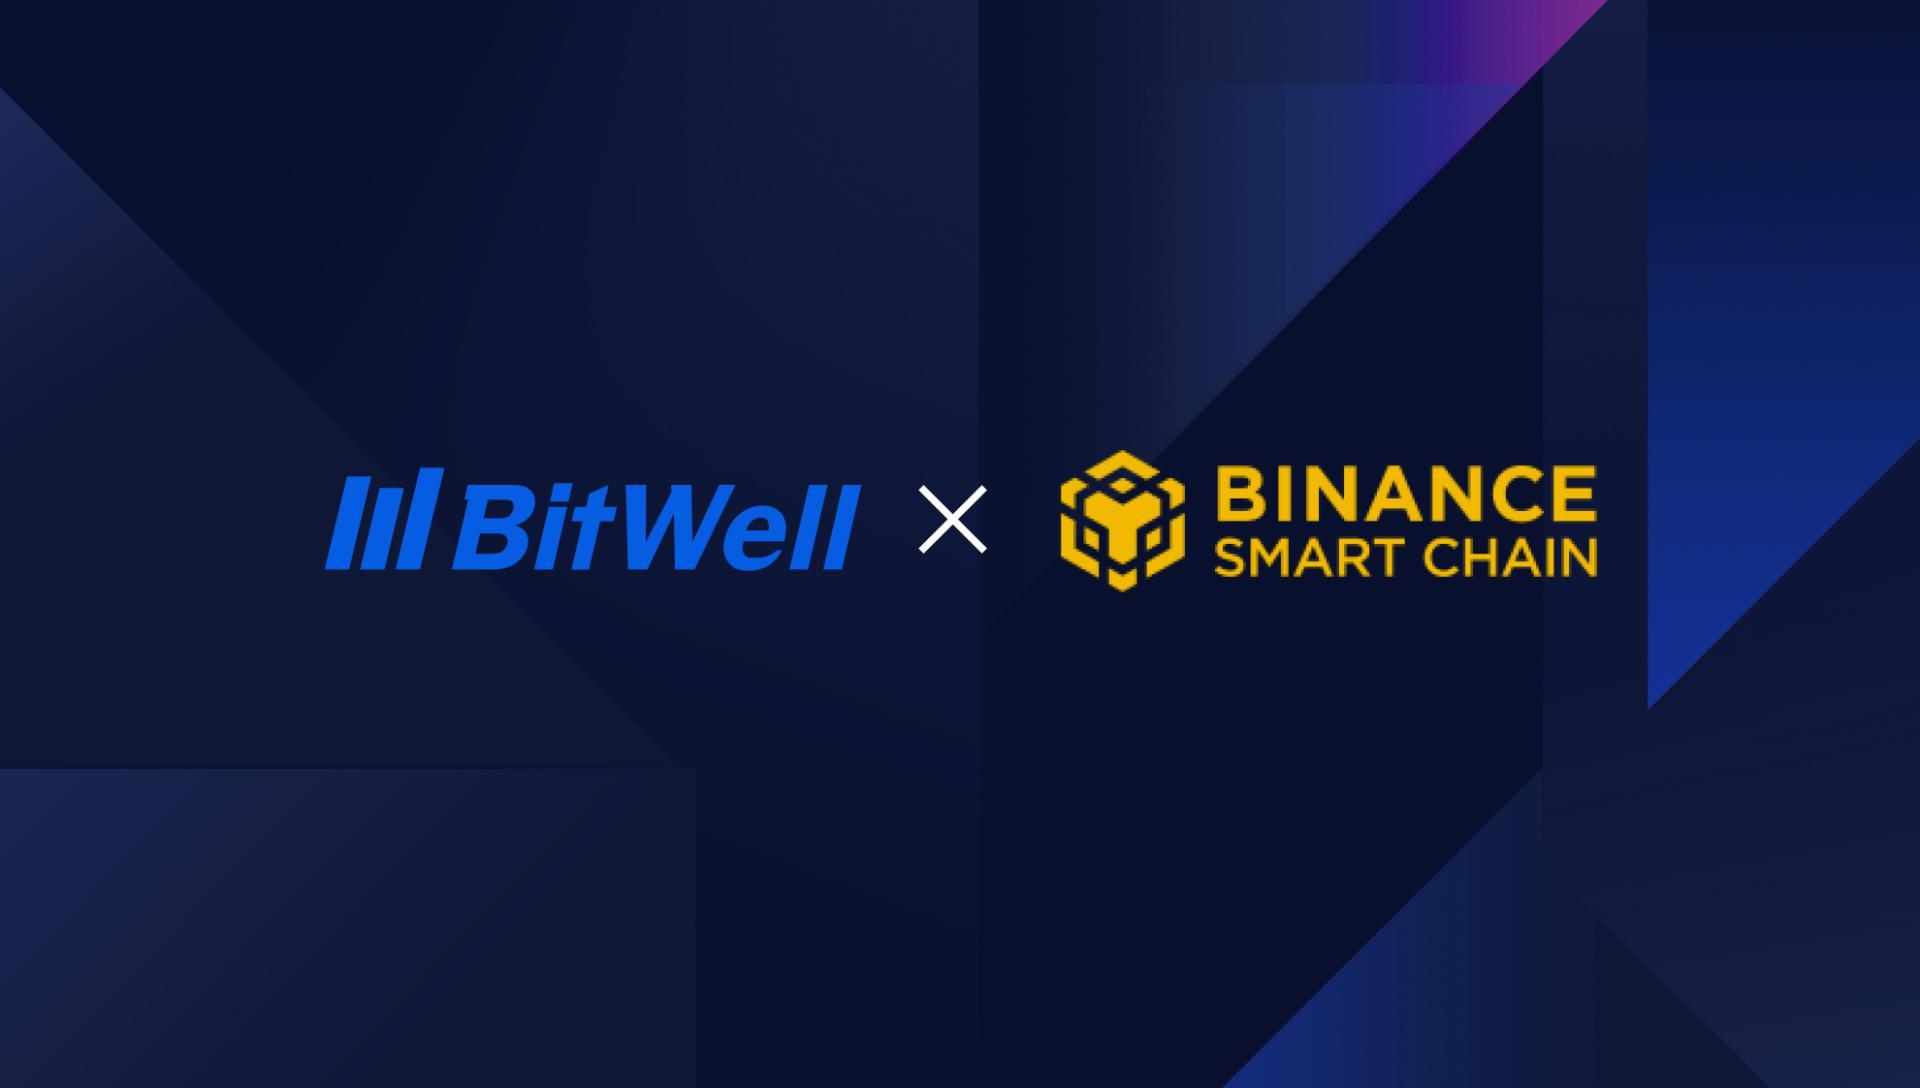 BitWell与币安智能链BSC达成深度合作 WELL将跨链接入BSC